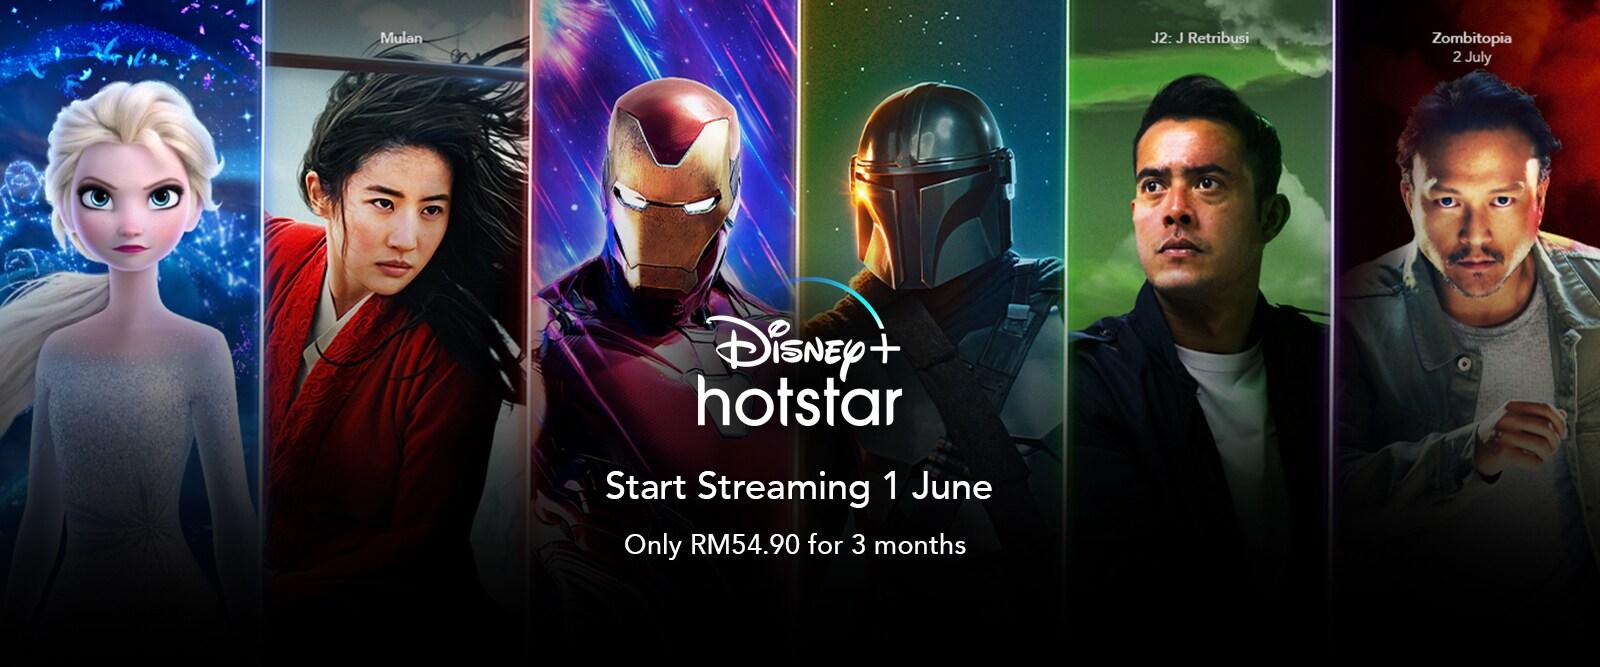 Disney+ Hotstar Malaysia Pre-Launch   Homepage